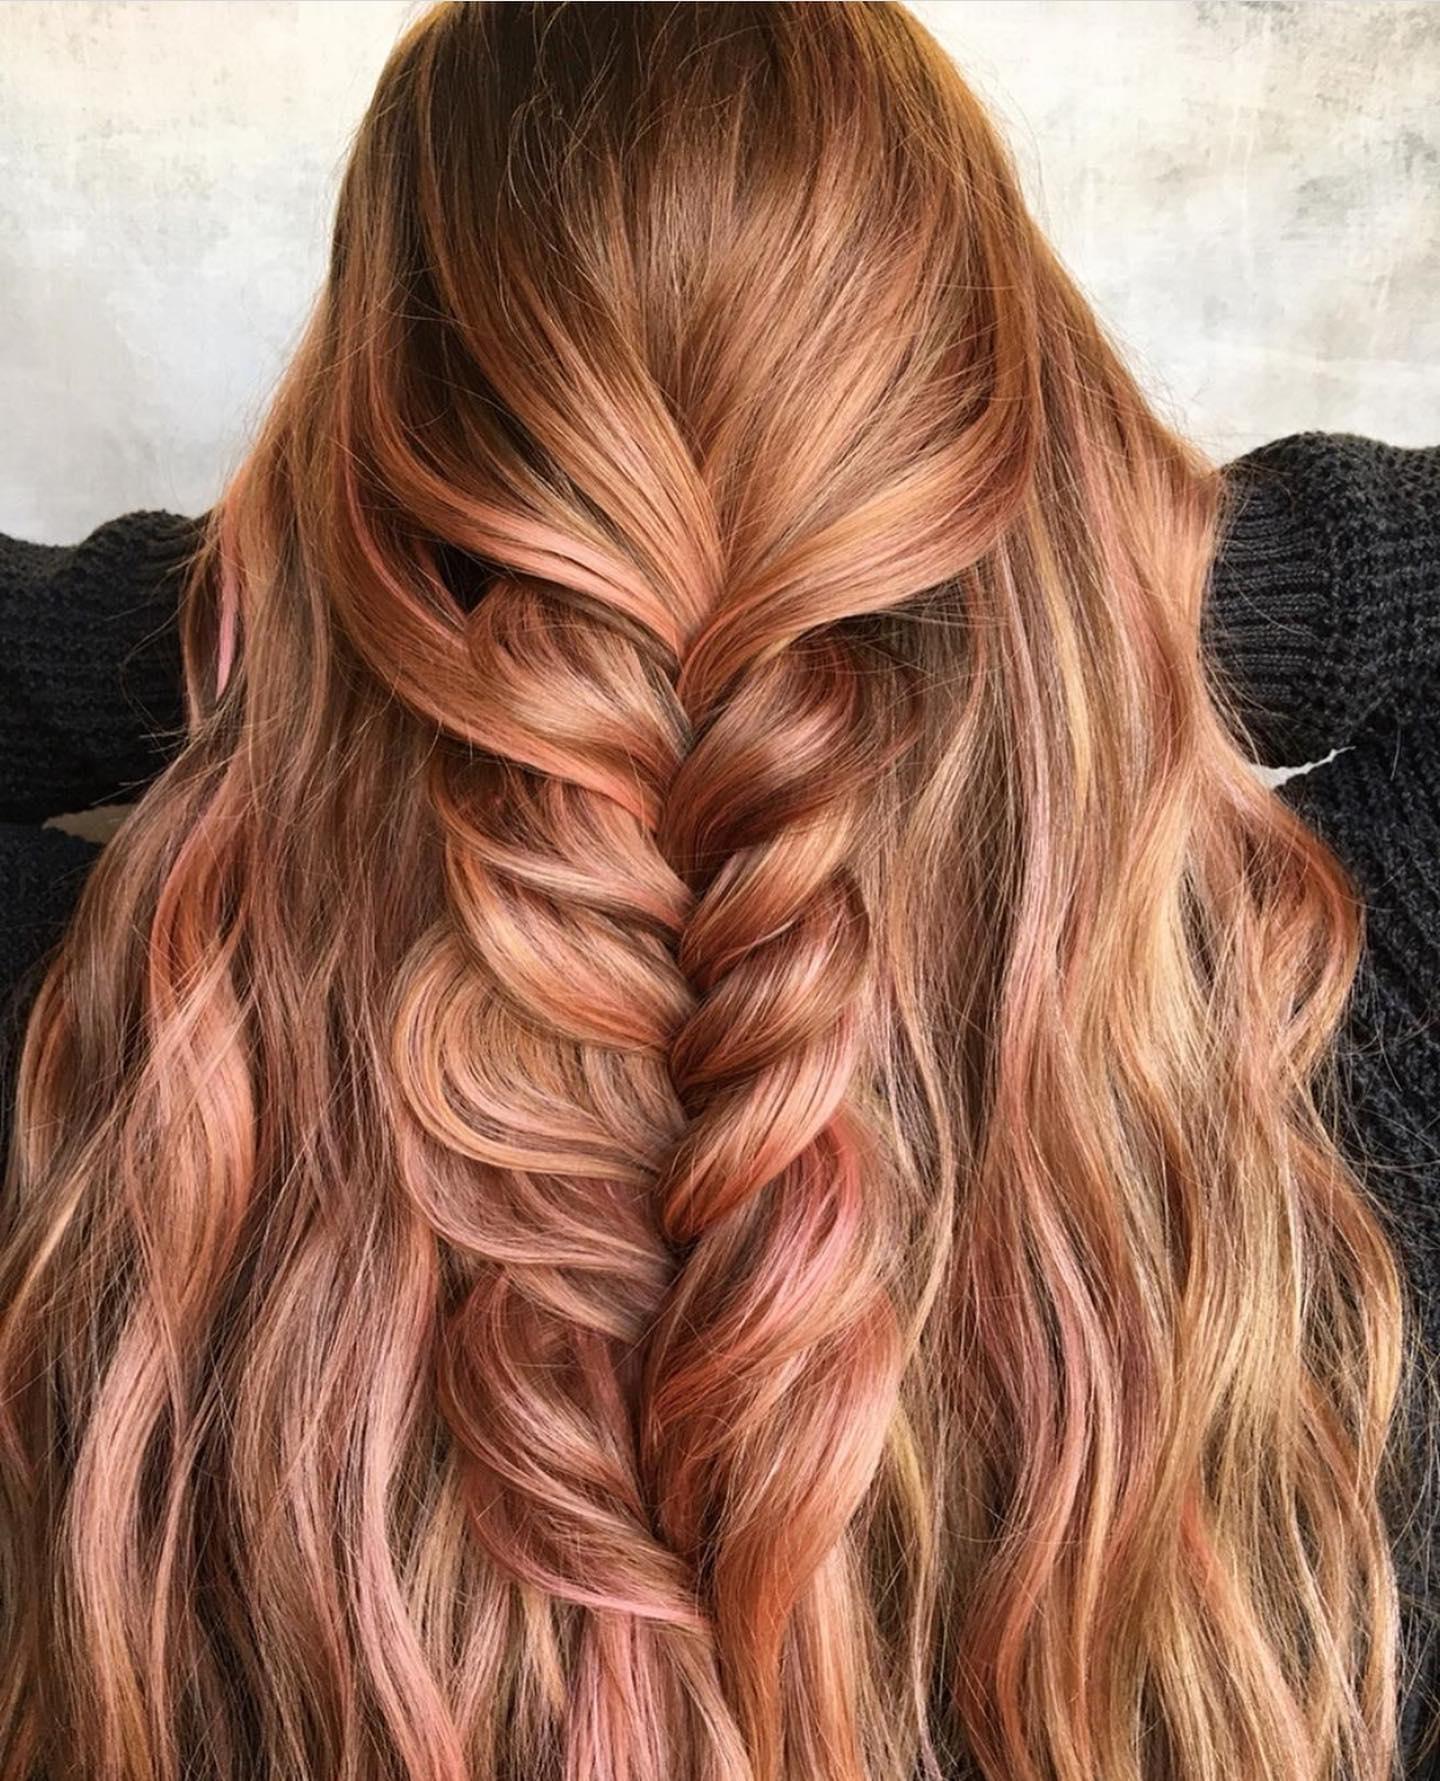 The Copper Comb